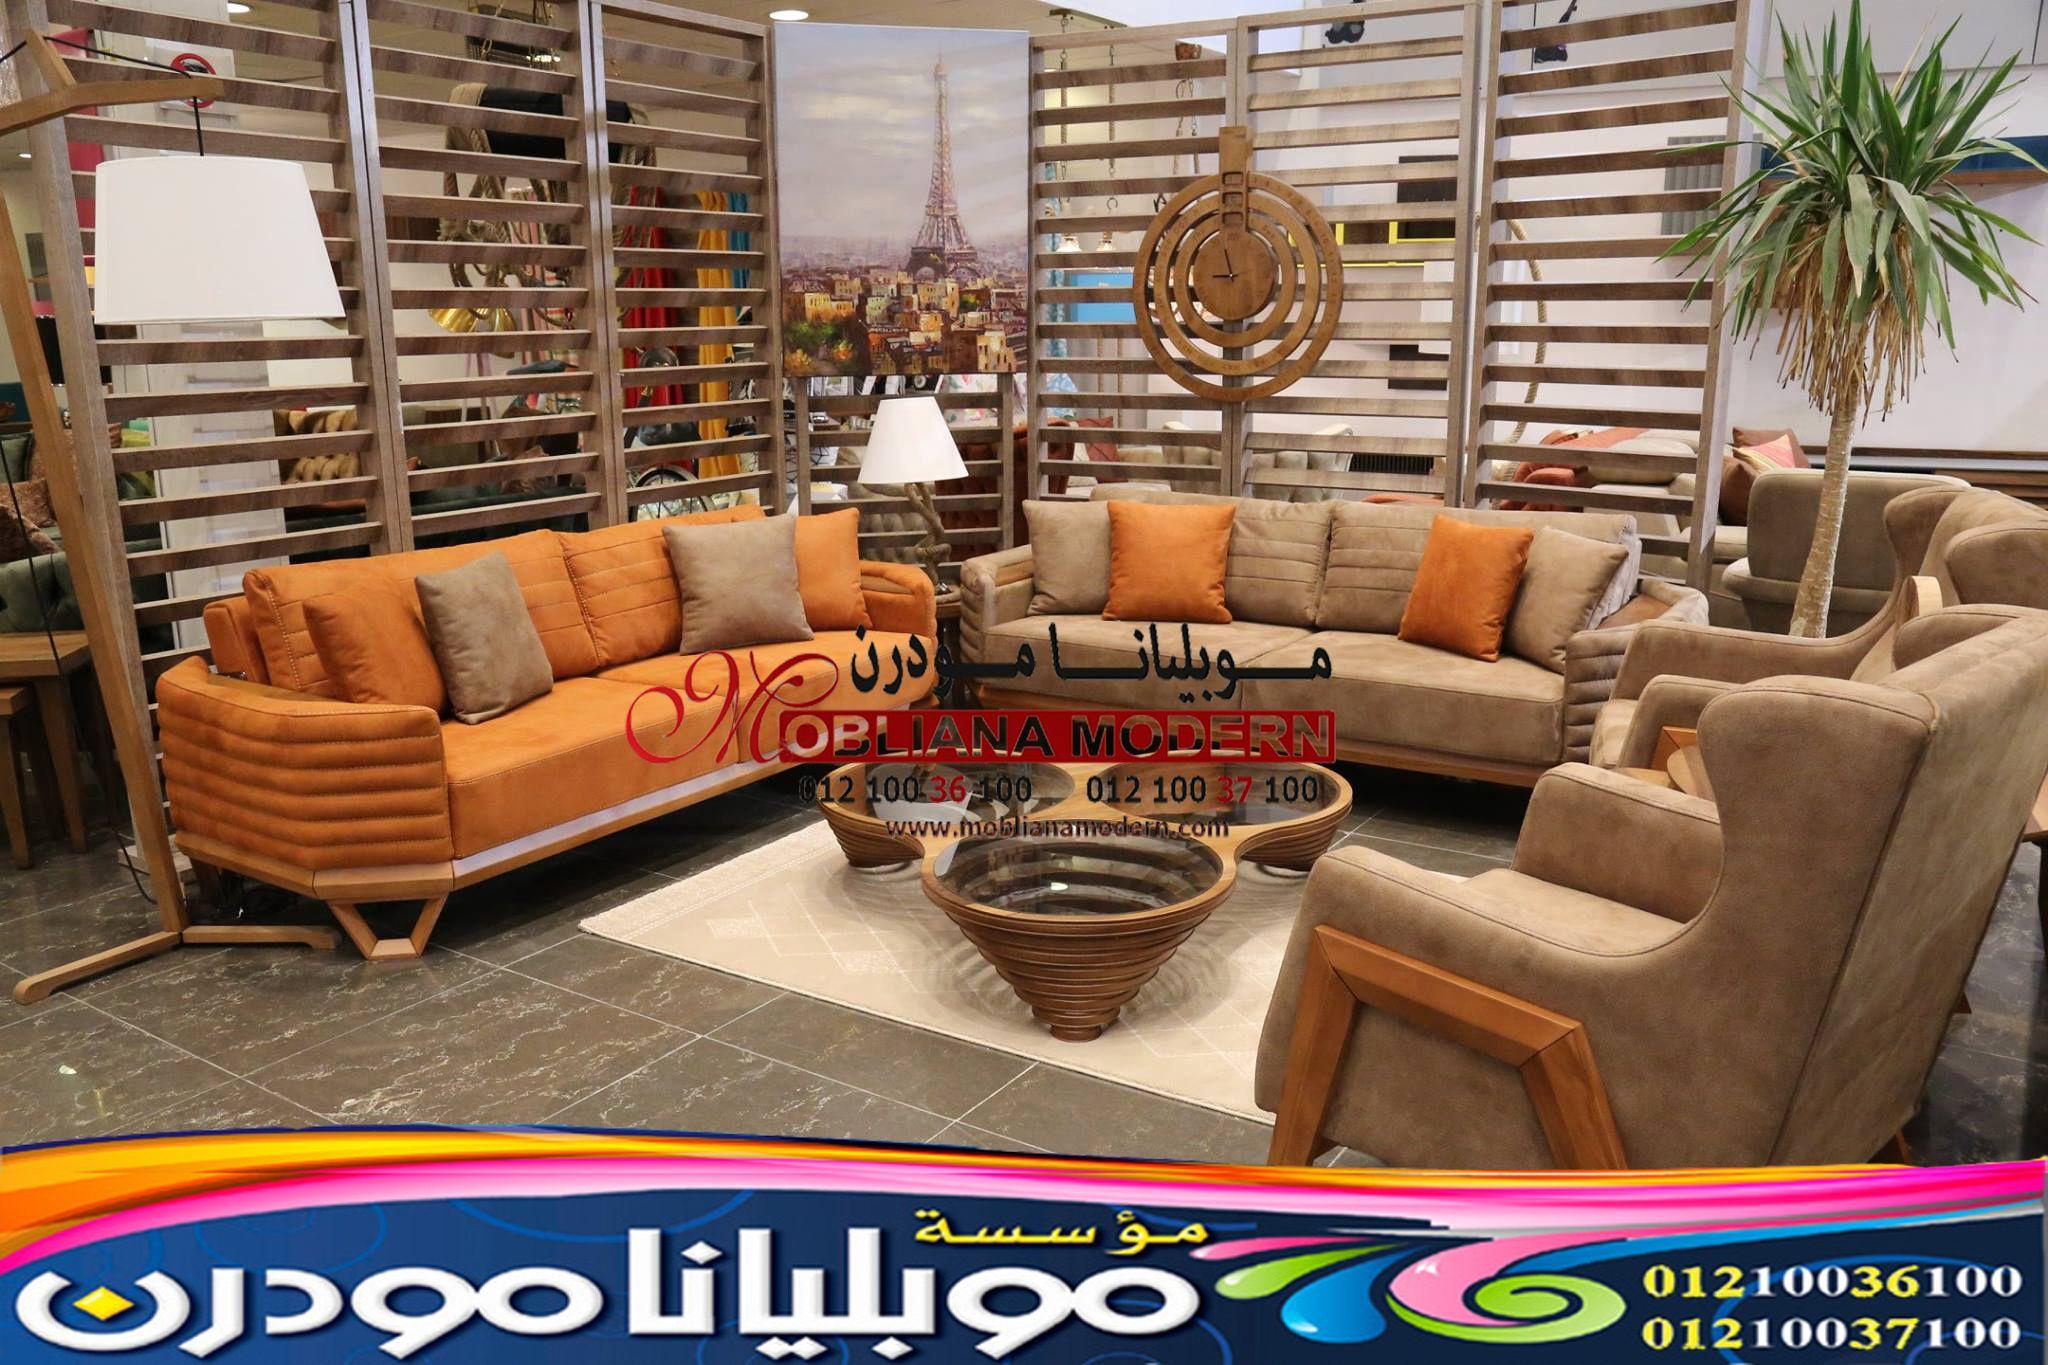 اثاث موبليانا مودرن كتالوج أحدث صور انتريهات مودرن و كلاسيك 2021 Home Furniture Furniture Home